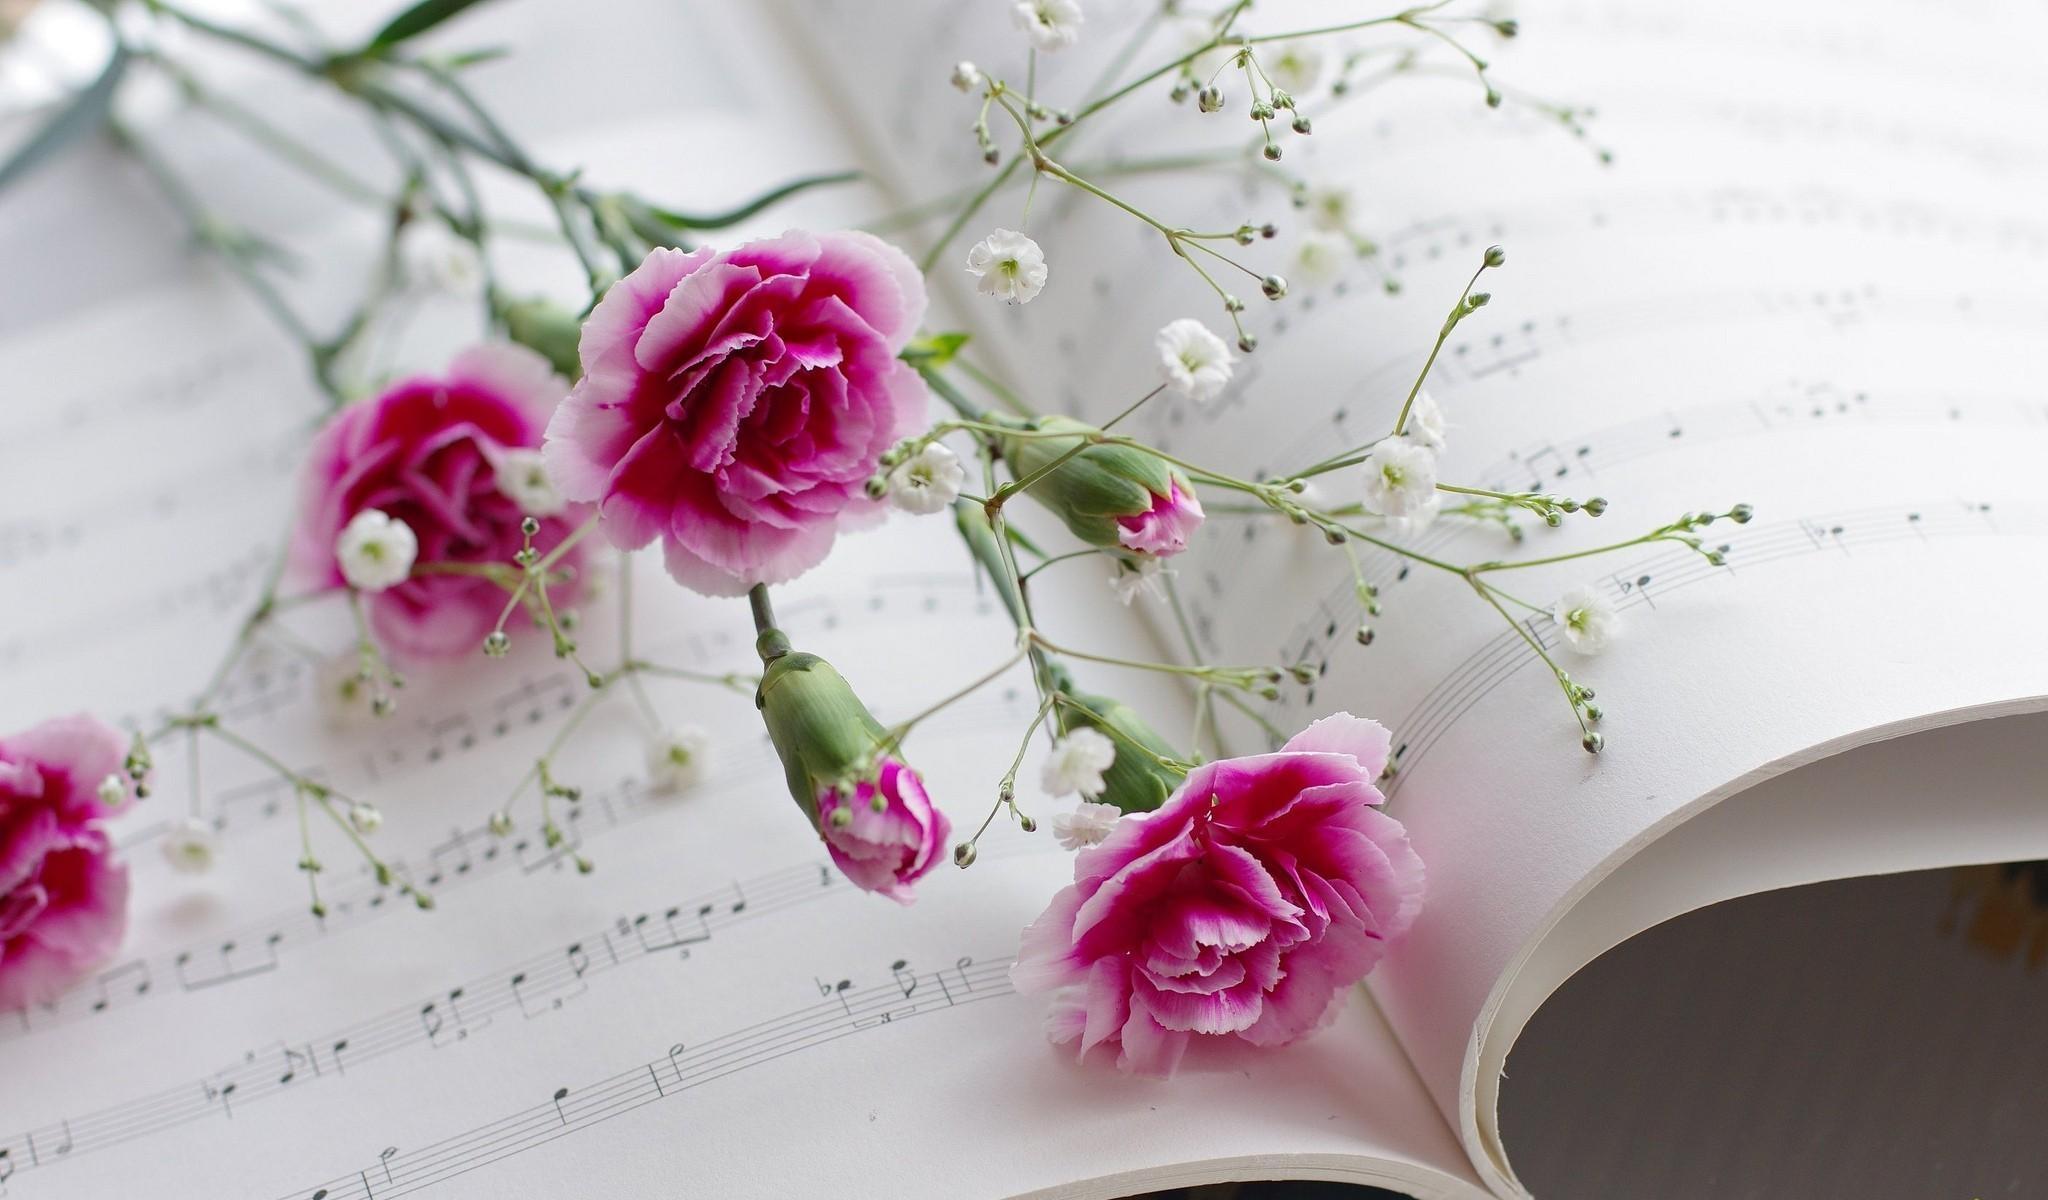 Amazing Wallpaper Music Spring - purple-music-blossom-pink-spring-flower-plant-flora-petal-land-plant-flowering-plant-floristry-flower-bouquet-flower-arranging-floral-design-carnations-sheet-music-gypsophila-642024  Photograph_795245.jpg